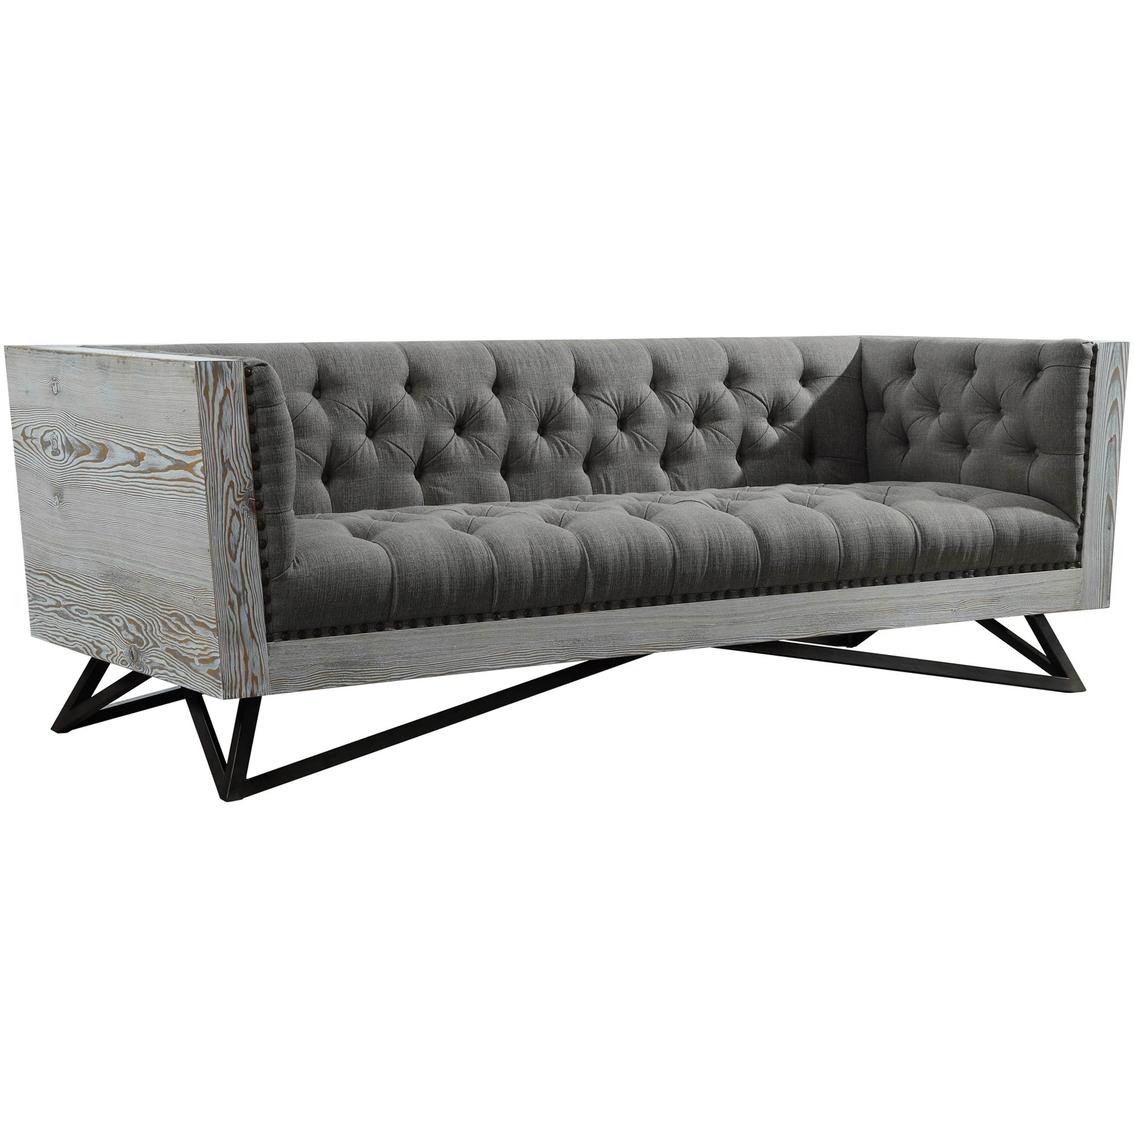 Armen Living Regis Sofa